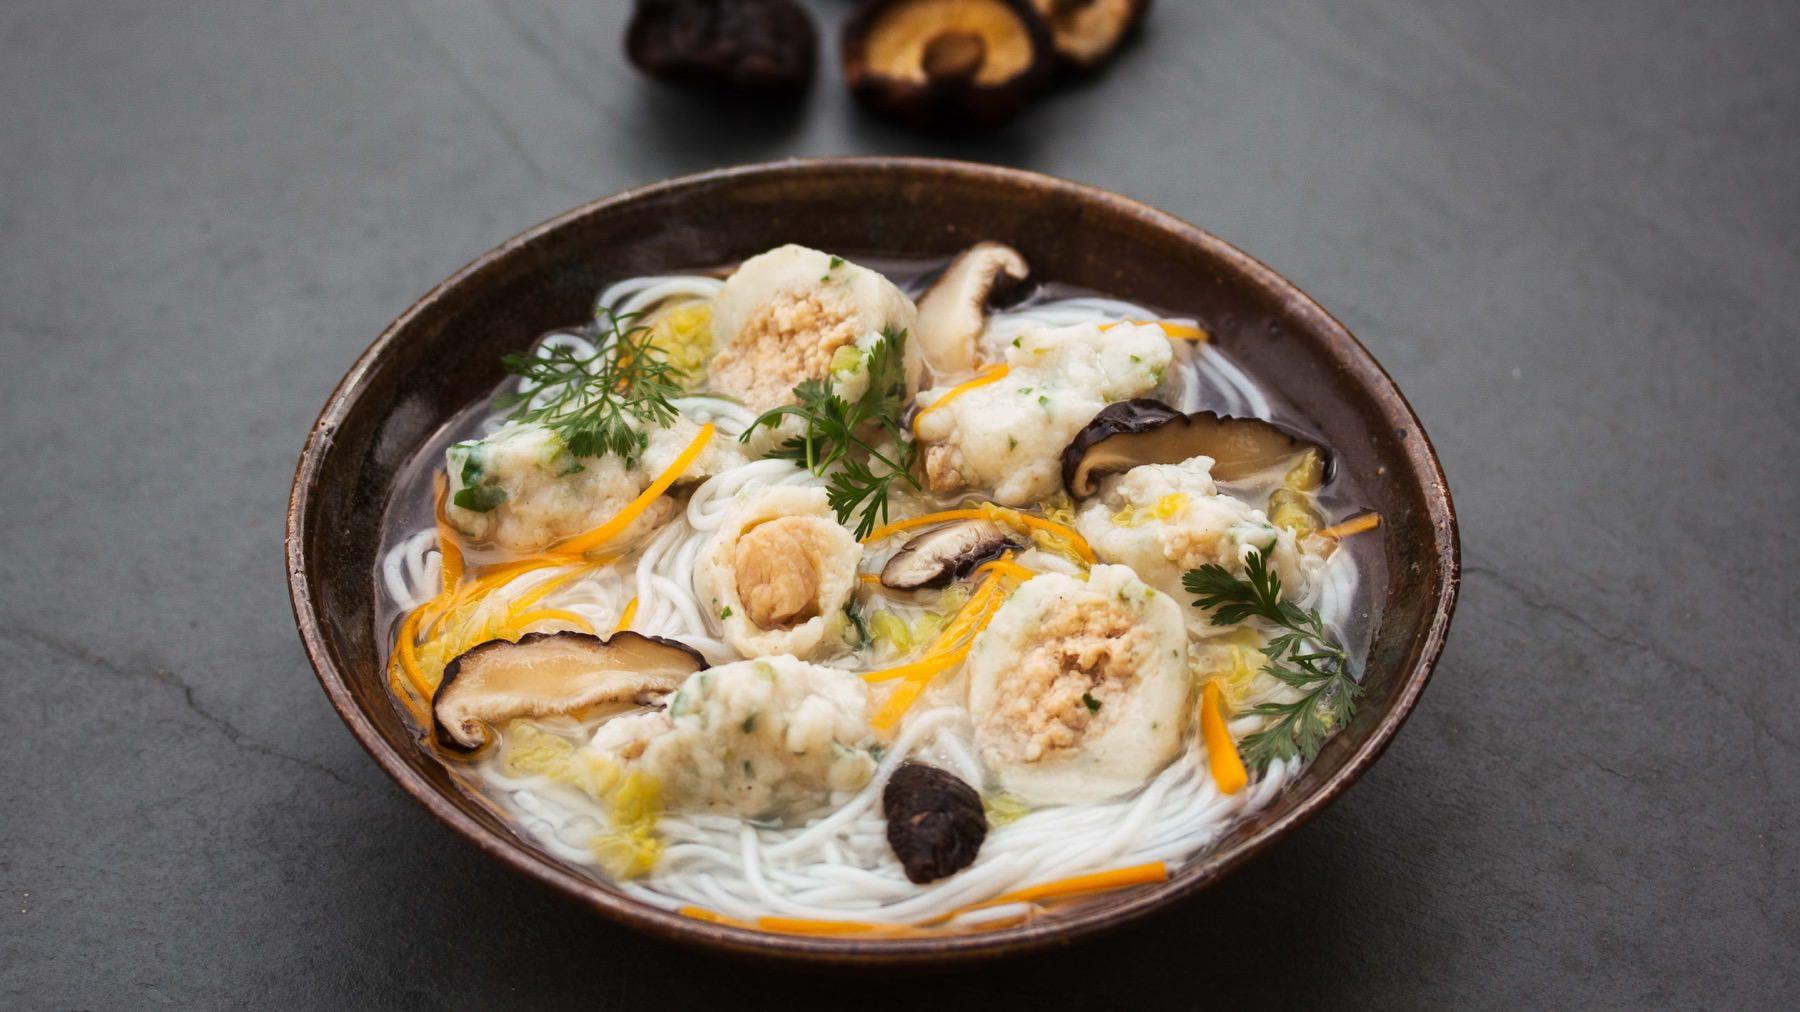 Nudelsuppe mit Fisch-Nocken - Yu Rou Geng Mian Tang